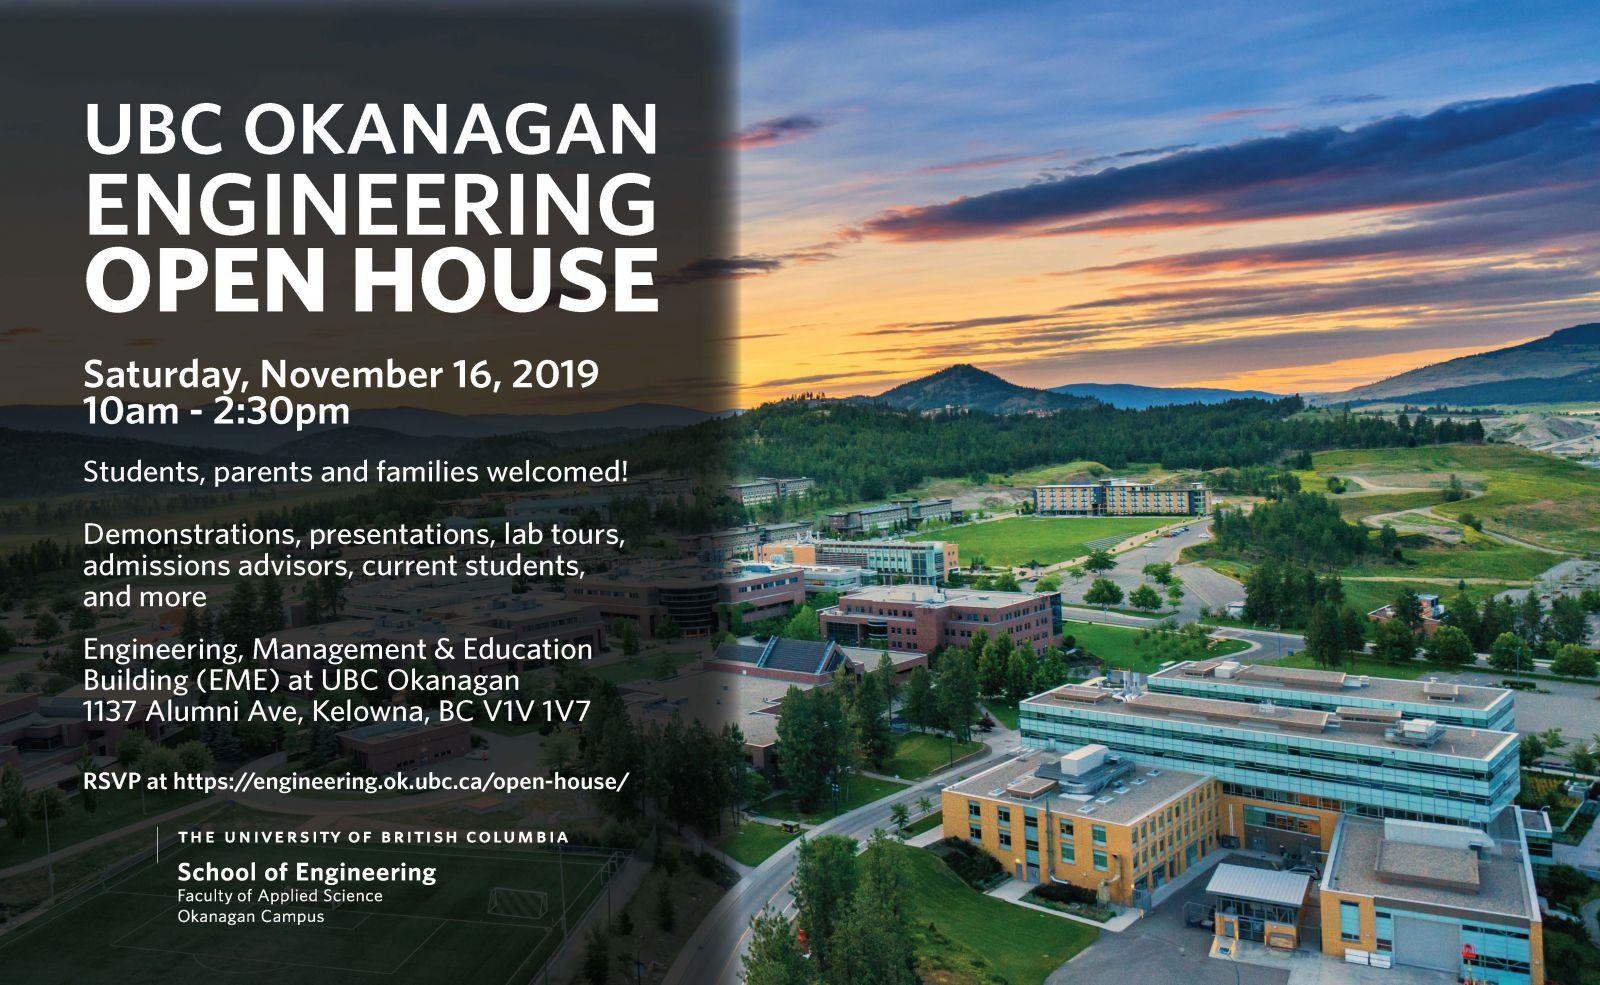 UBCO Engineering Open House